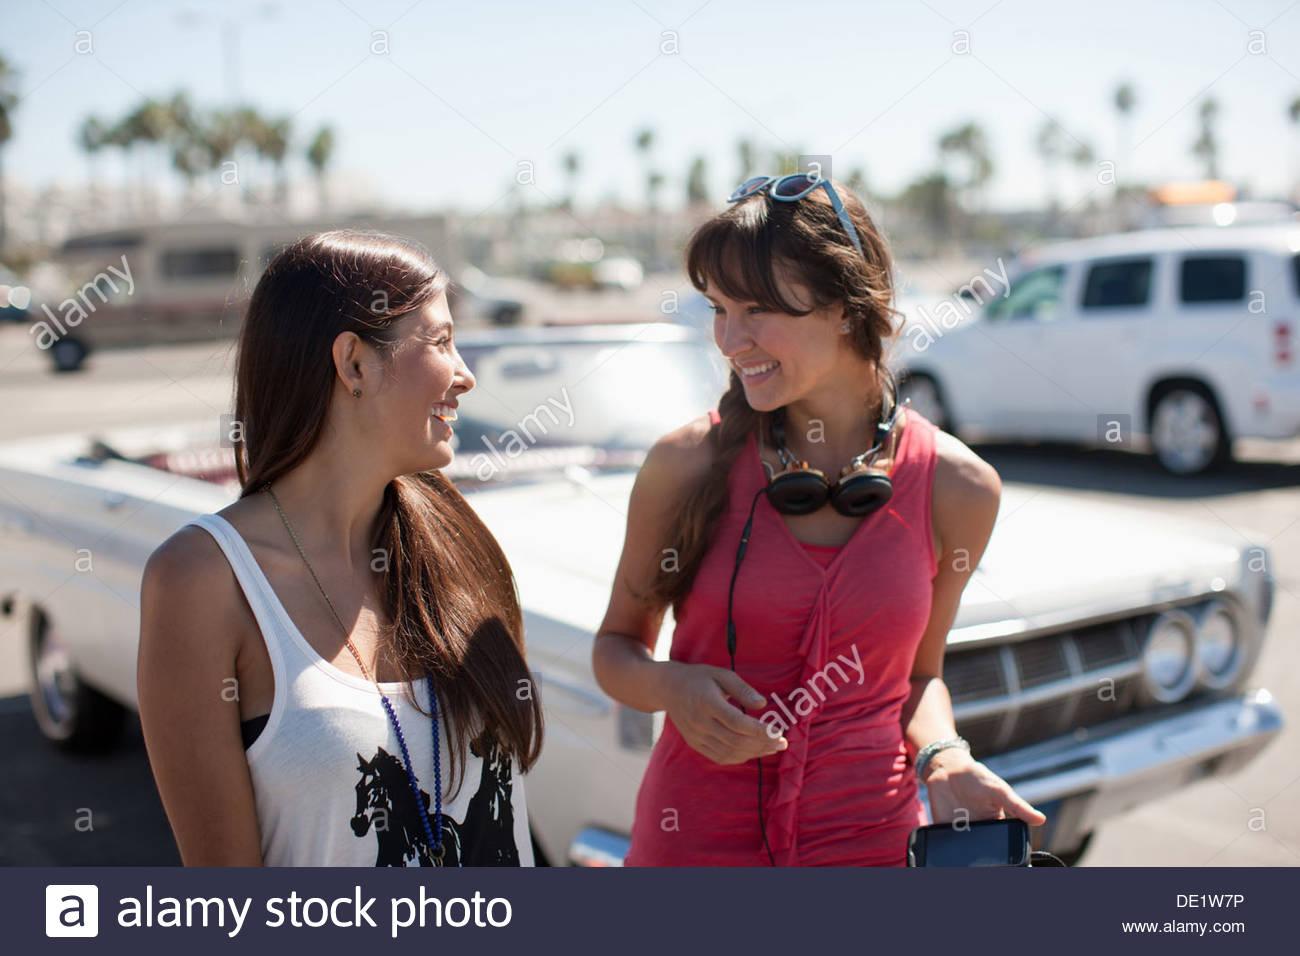 Two women talking - Stock Image